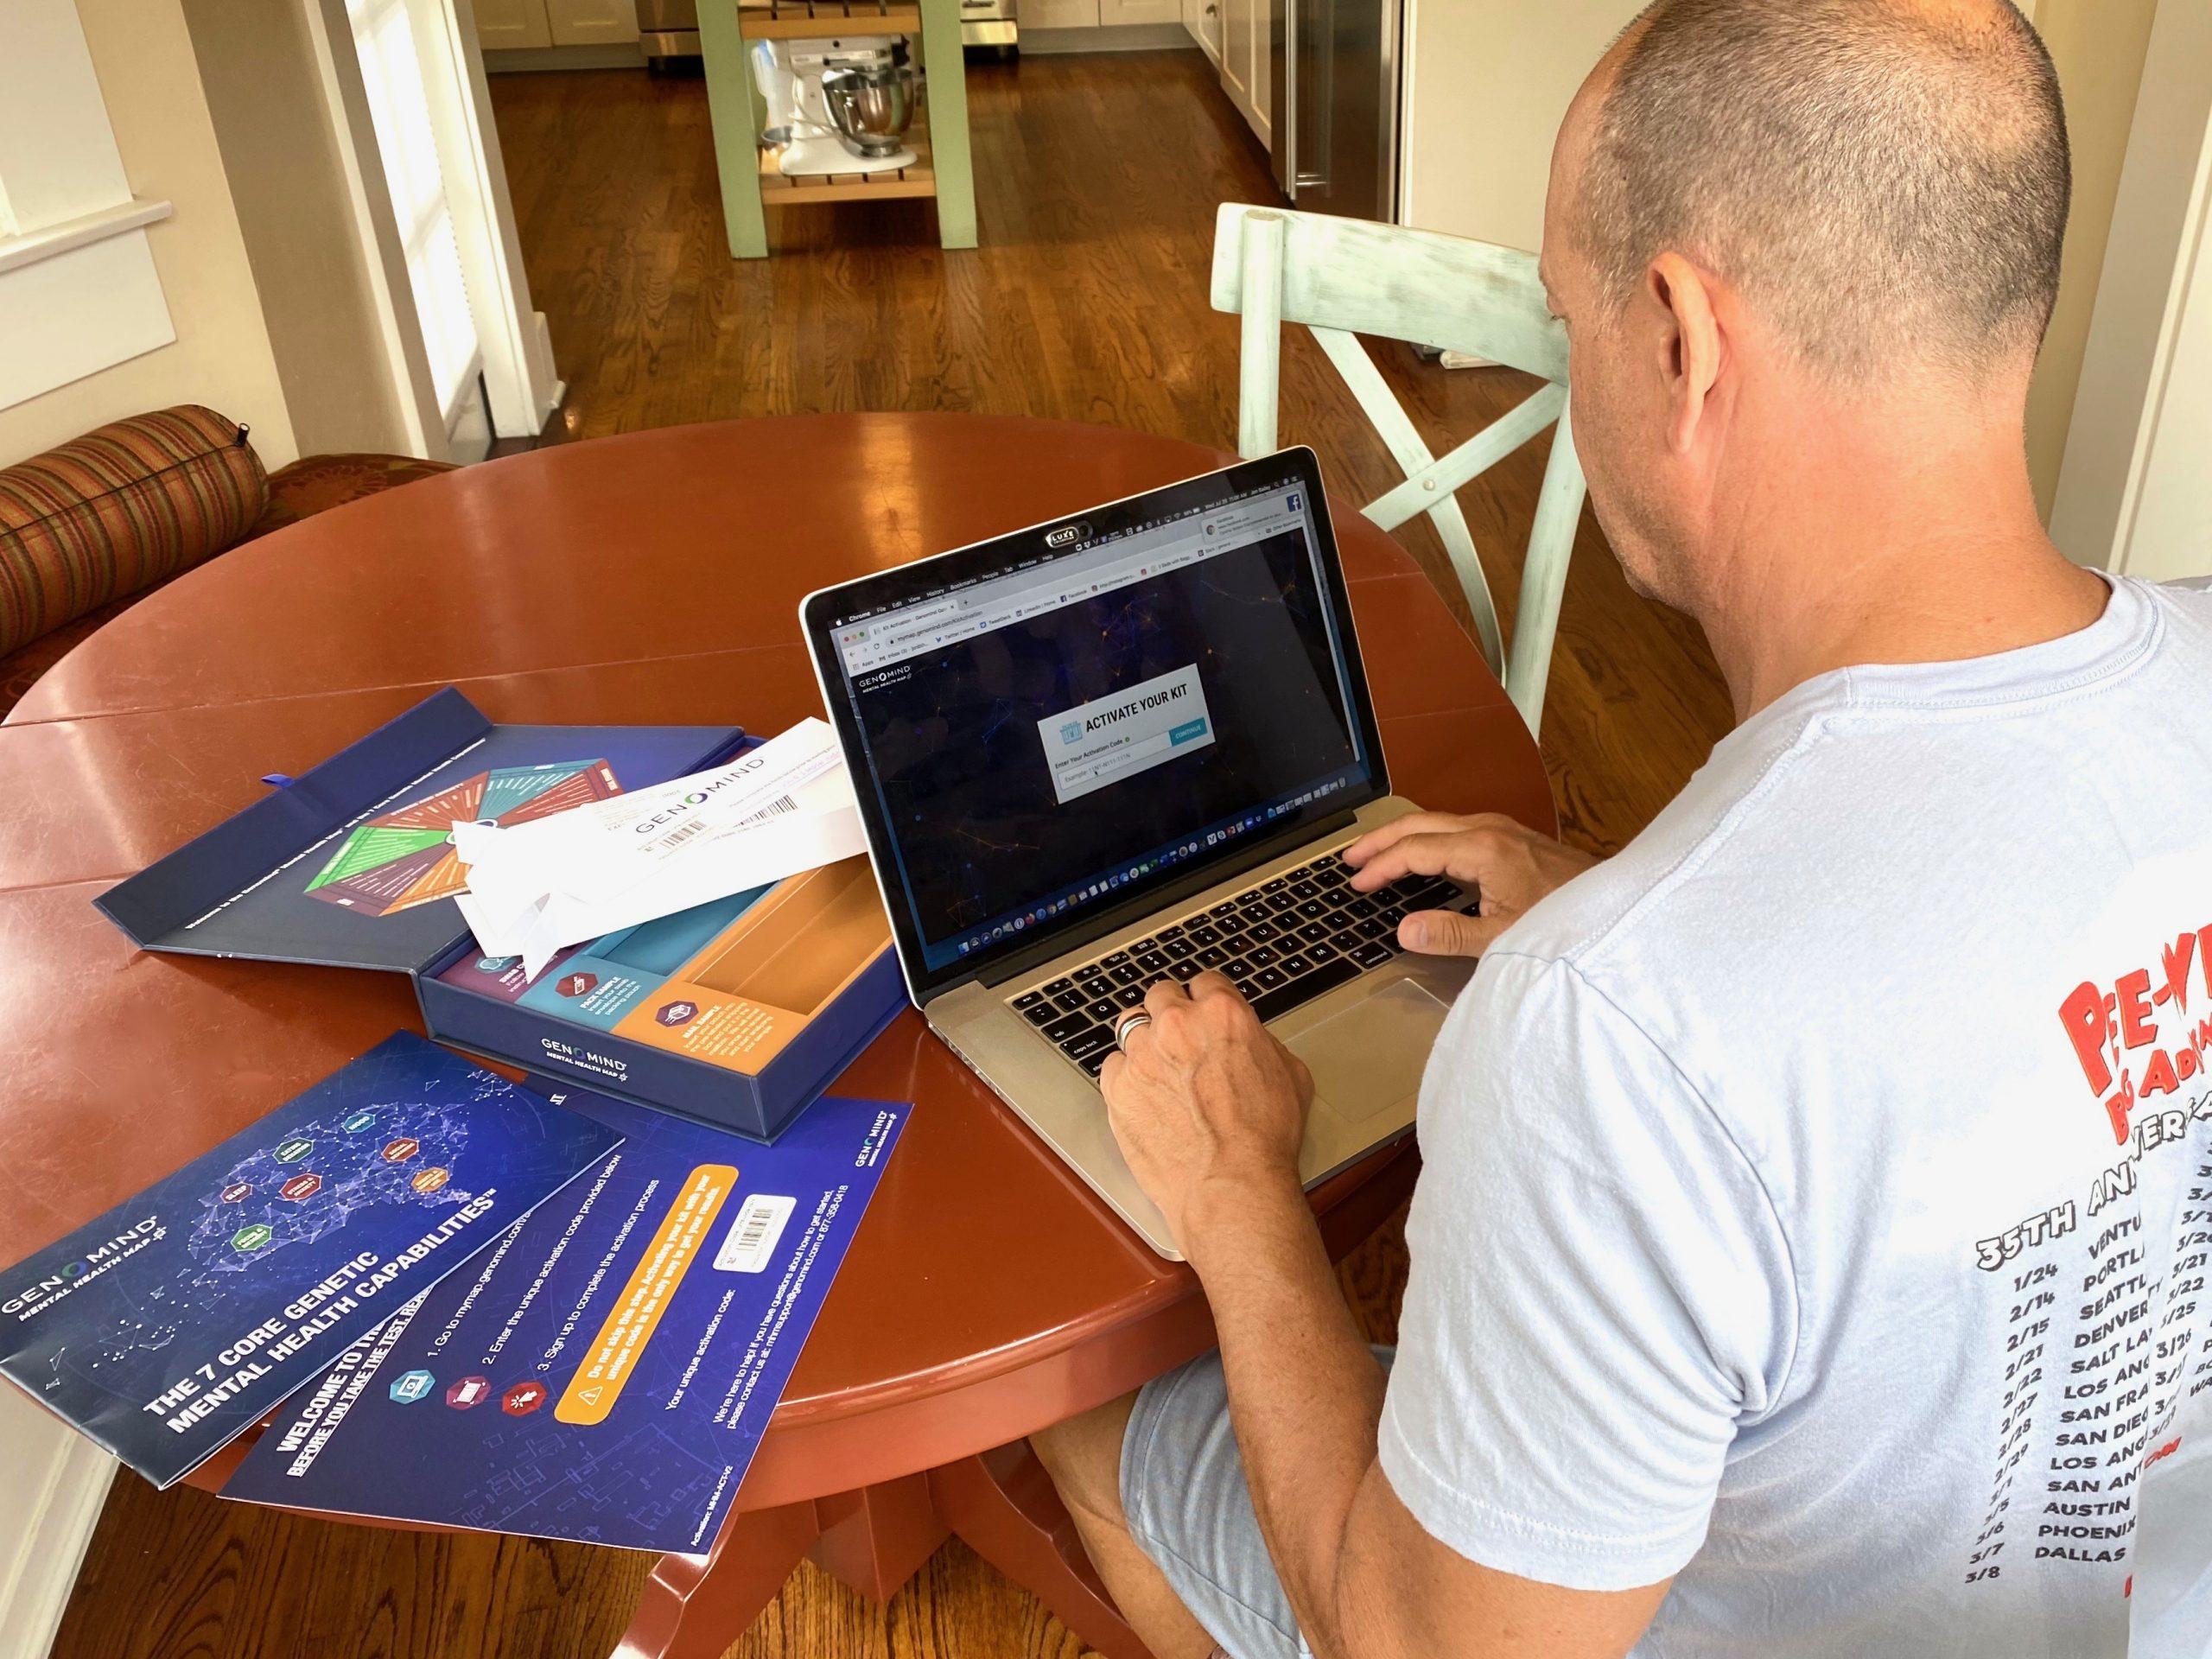 Man signing up for Genomind genetics test